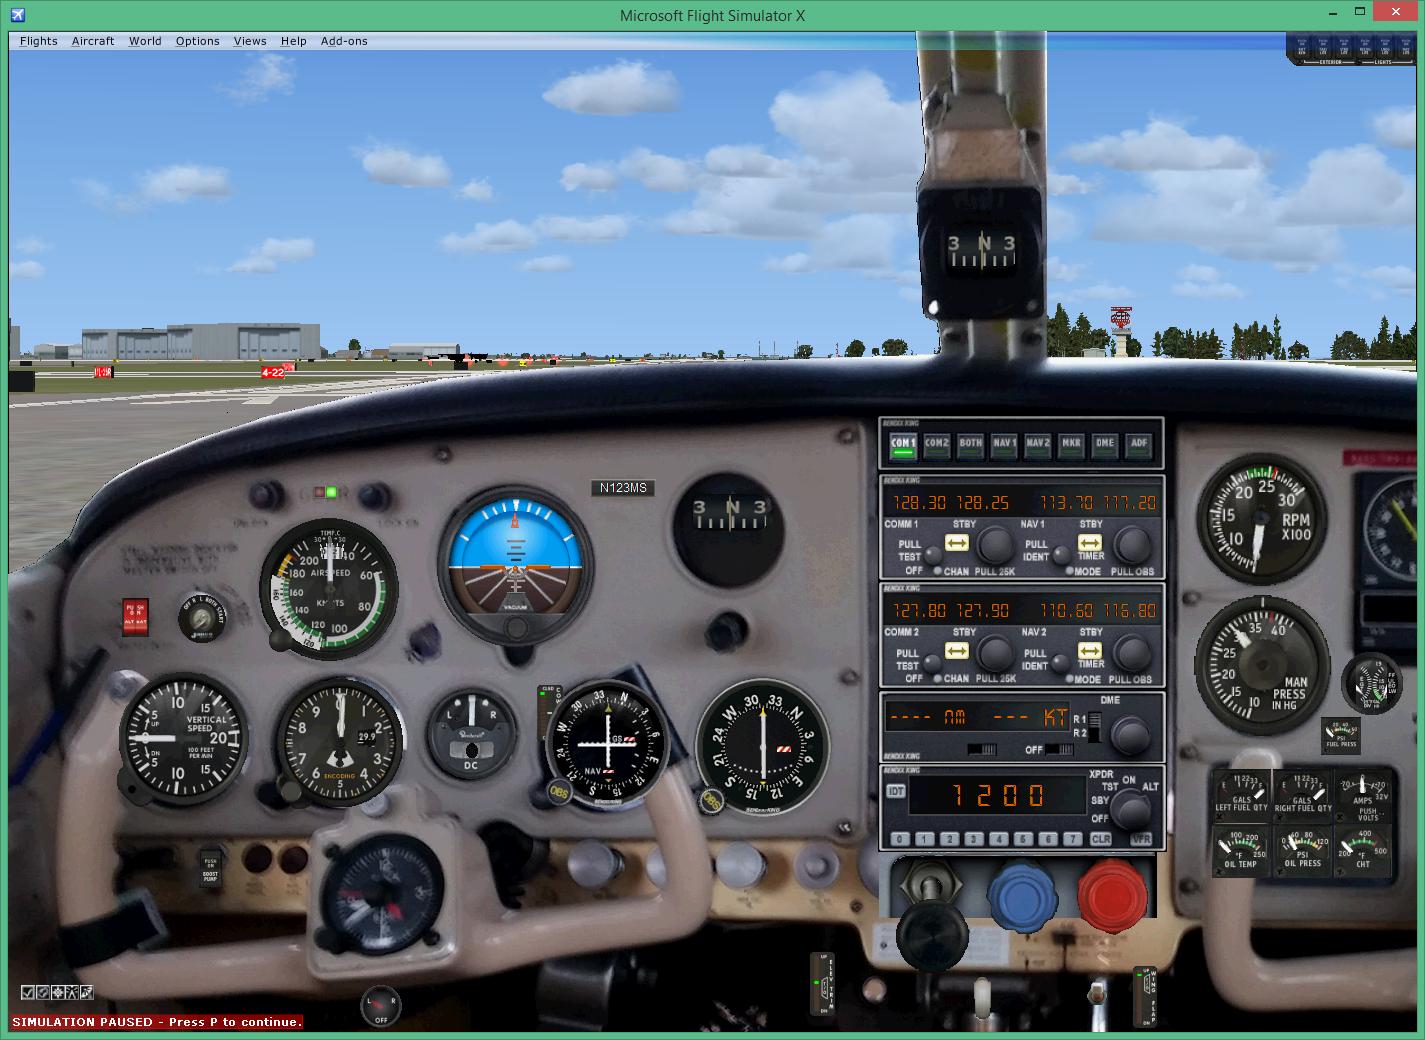 Creating custom M20C panel for flight simulator - General